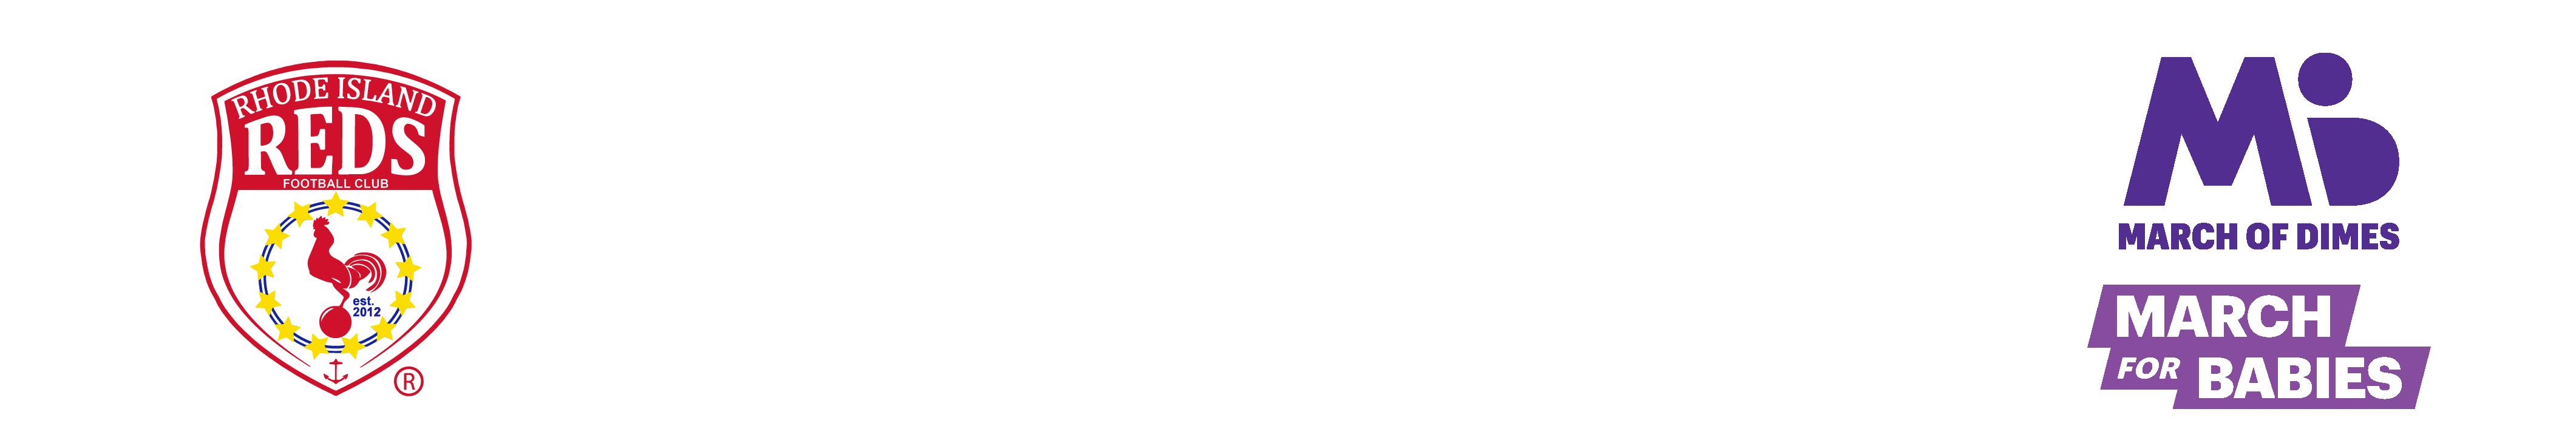 Final ri reds logo 01